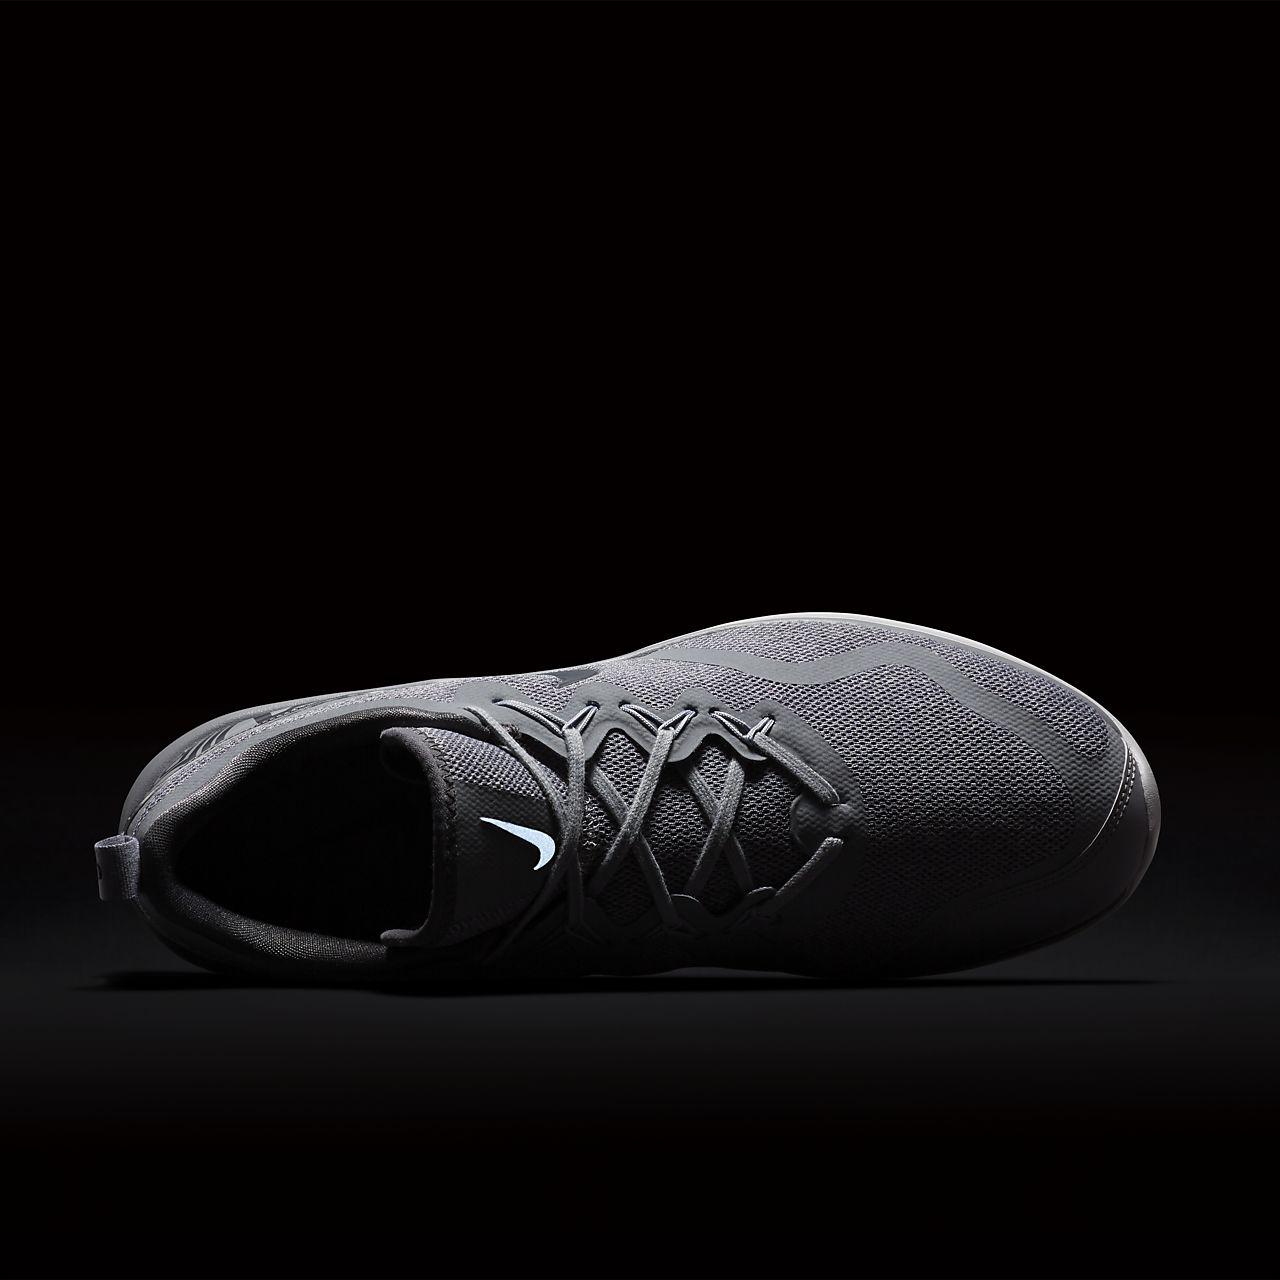 Scarpa da running Nike Air Max Fury Uomo